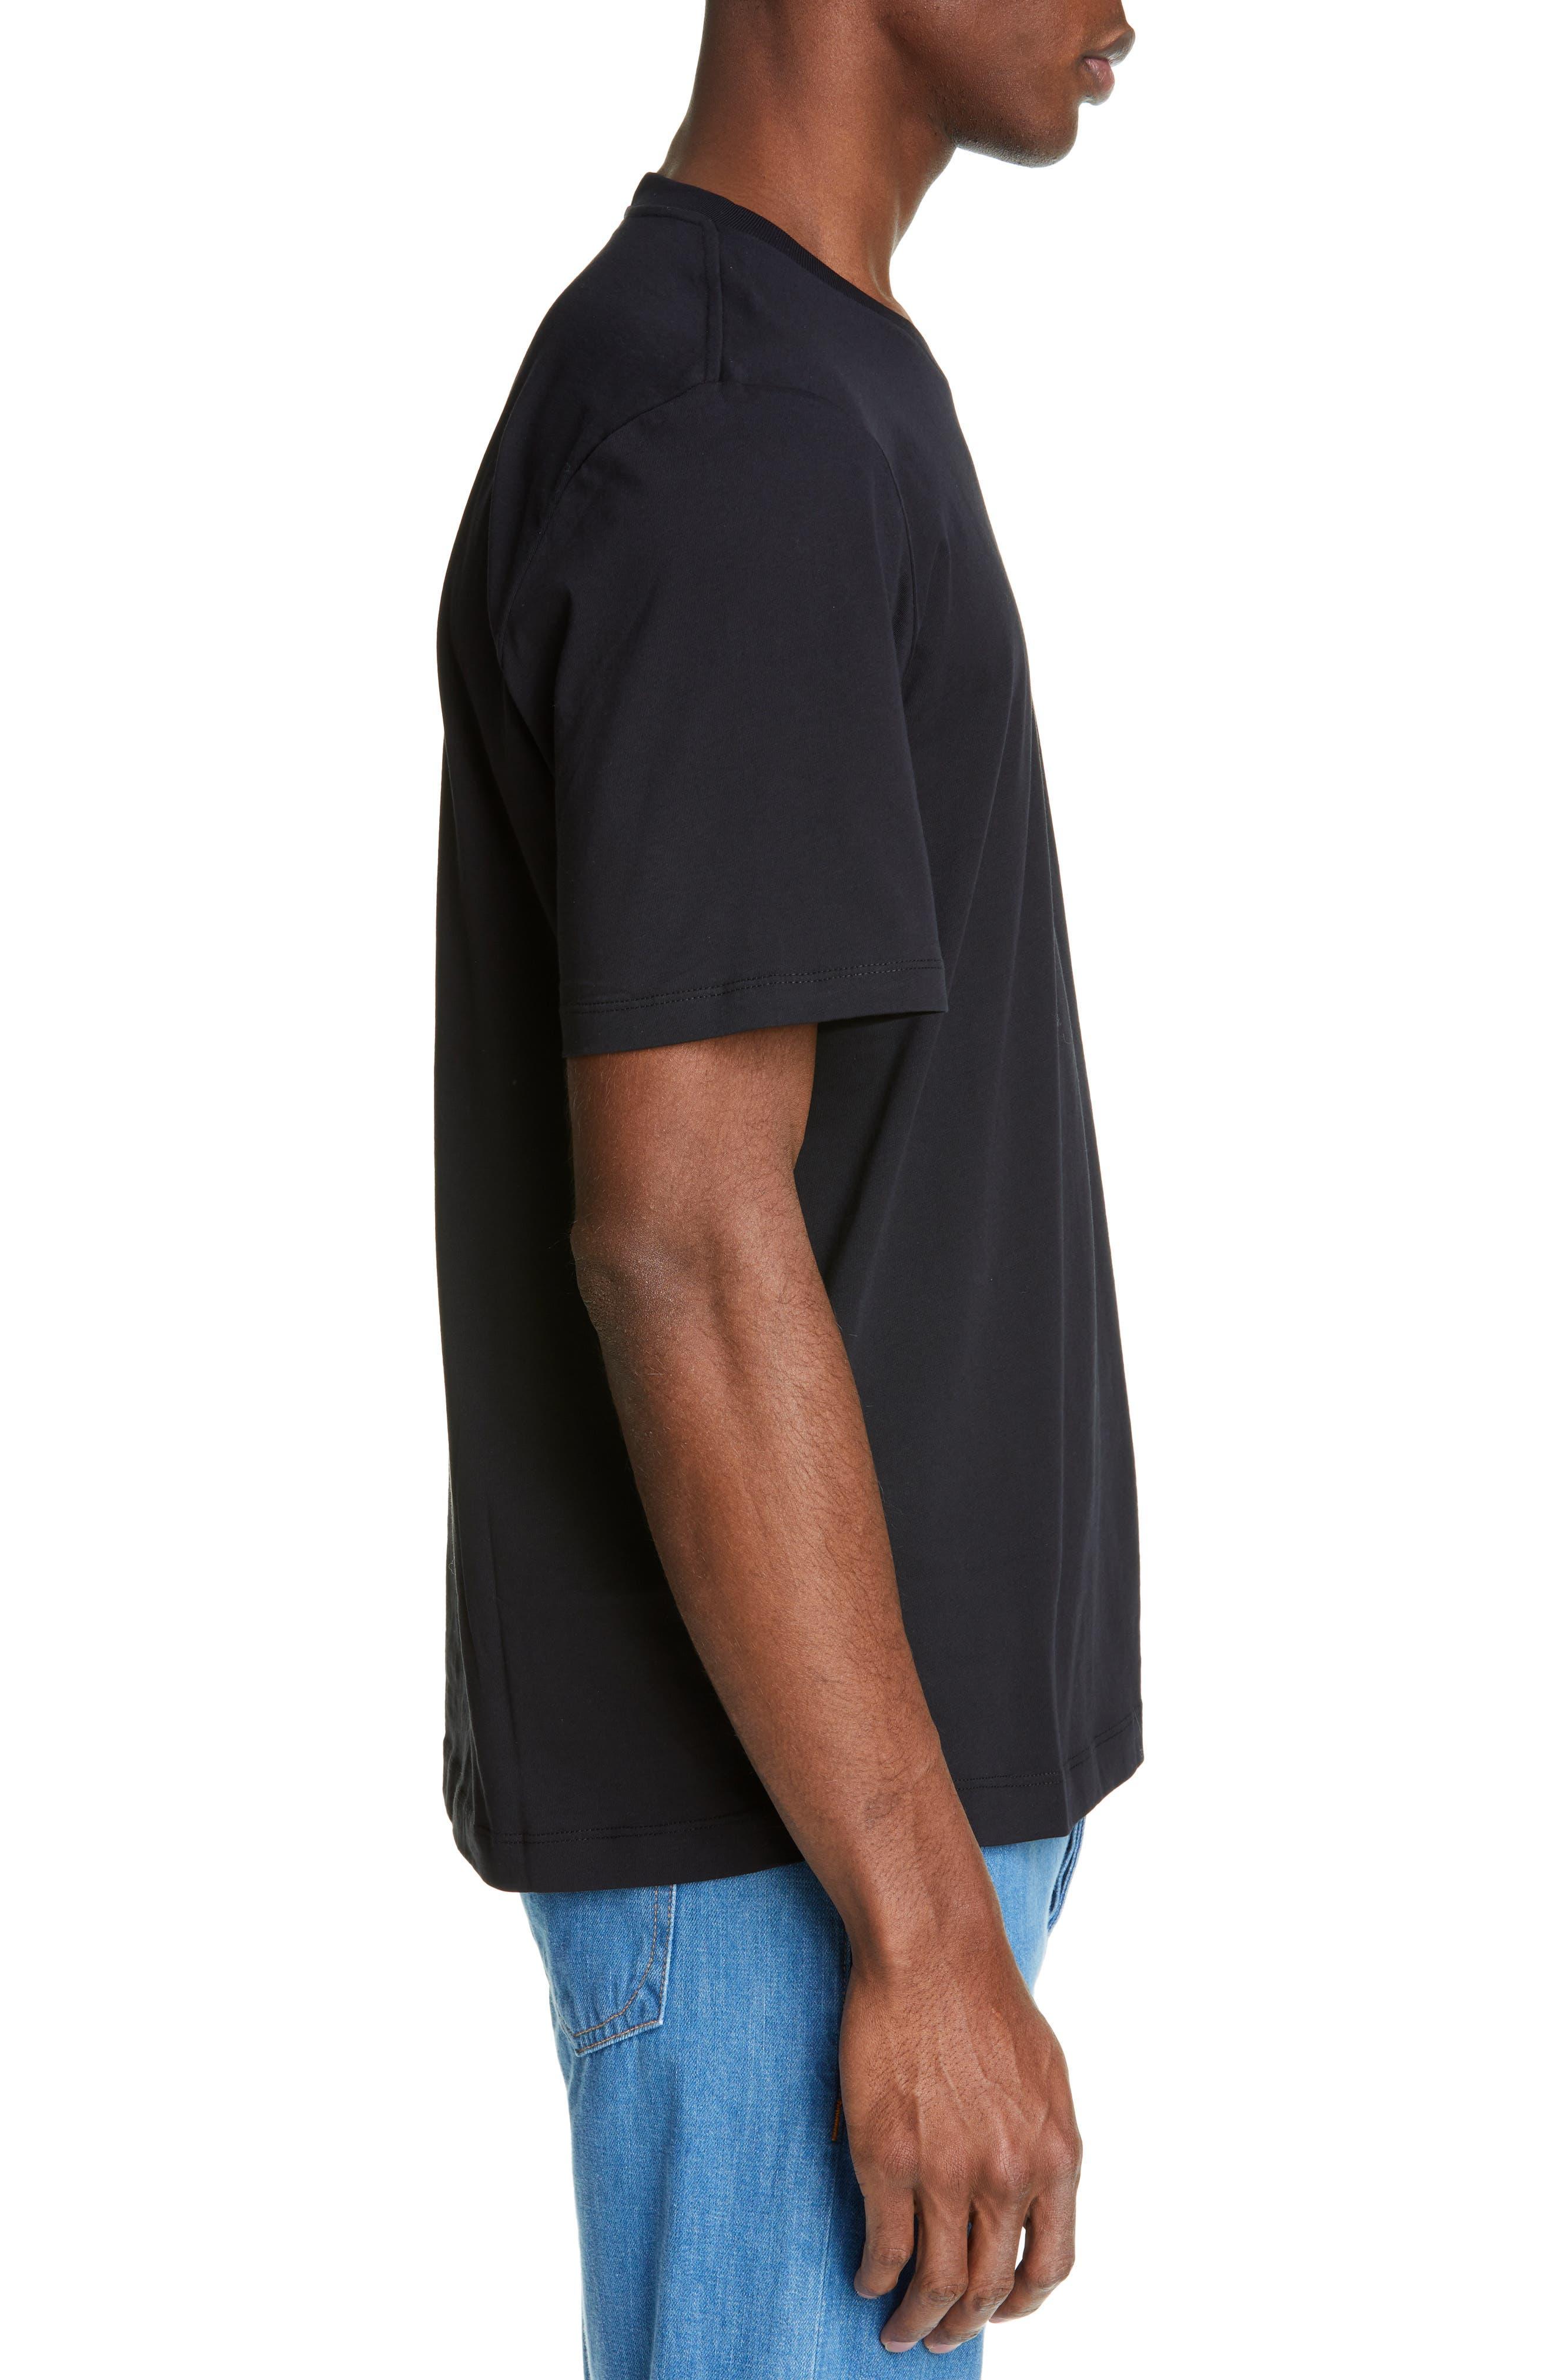 HELMUT LANG, Stacked Logo T-Shirt, Alternate thumbnail 3, color, BLACK BASALT